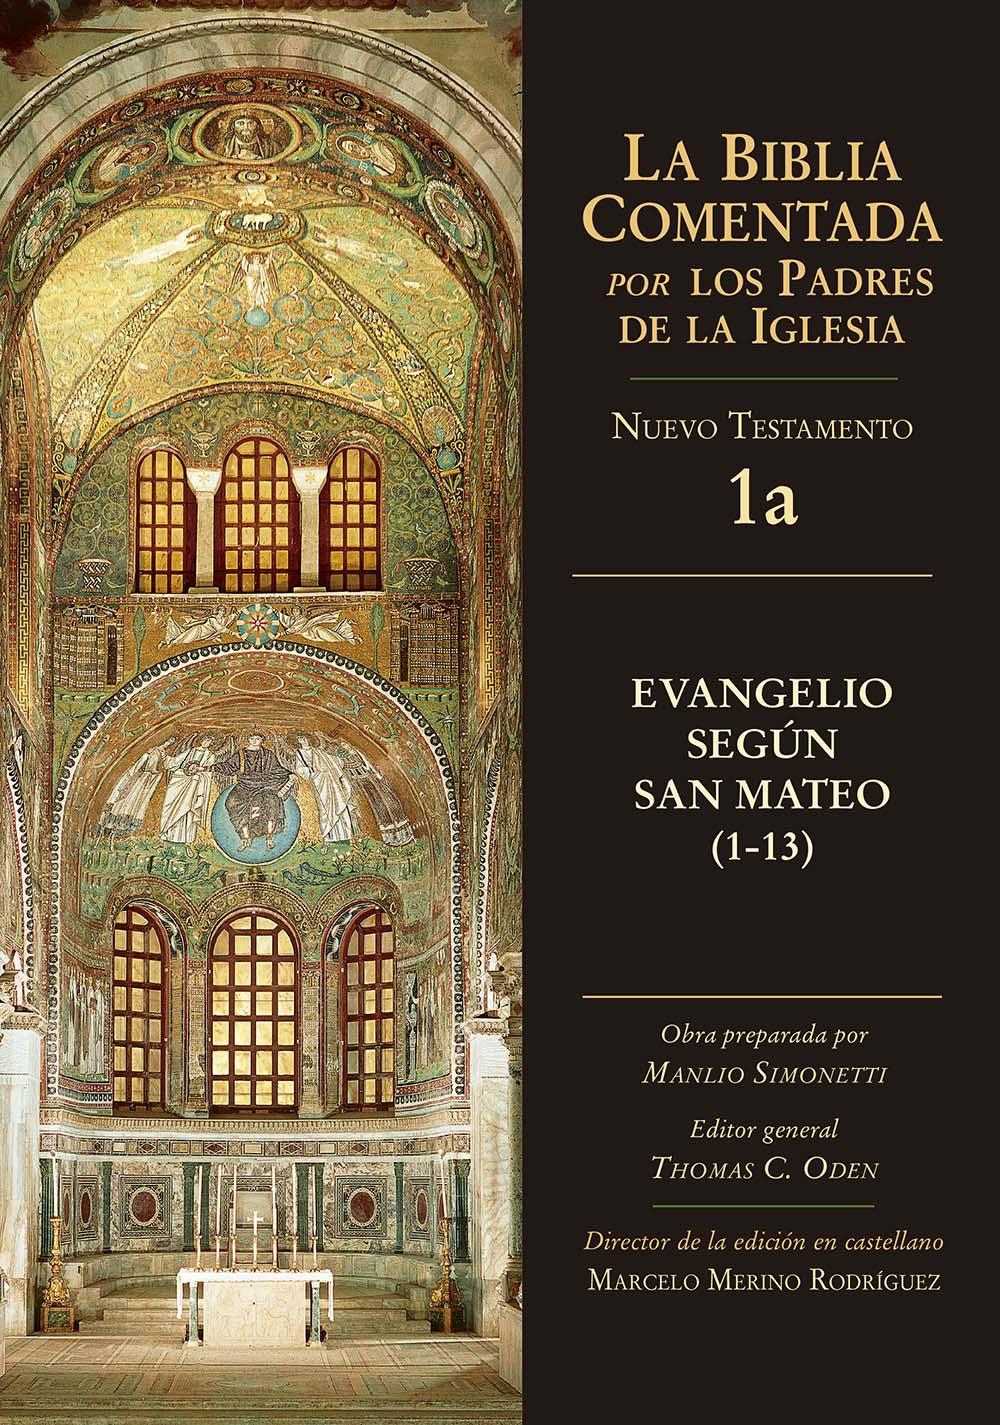 evangelio-segun-san-mateo-1-13